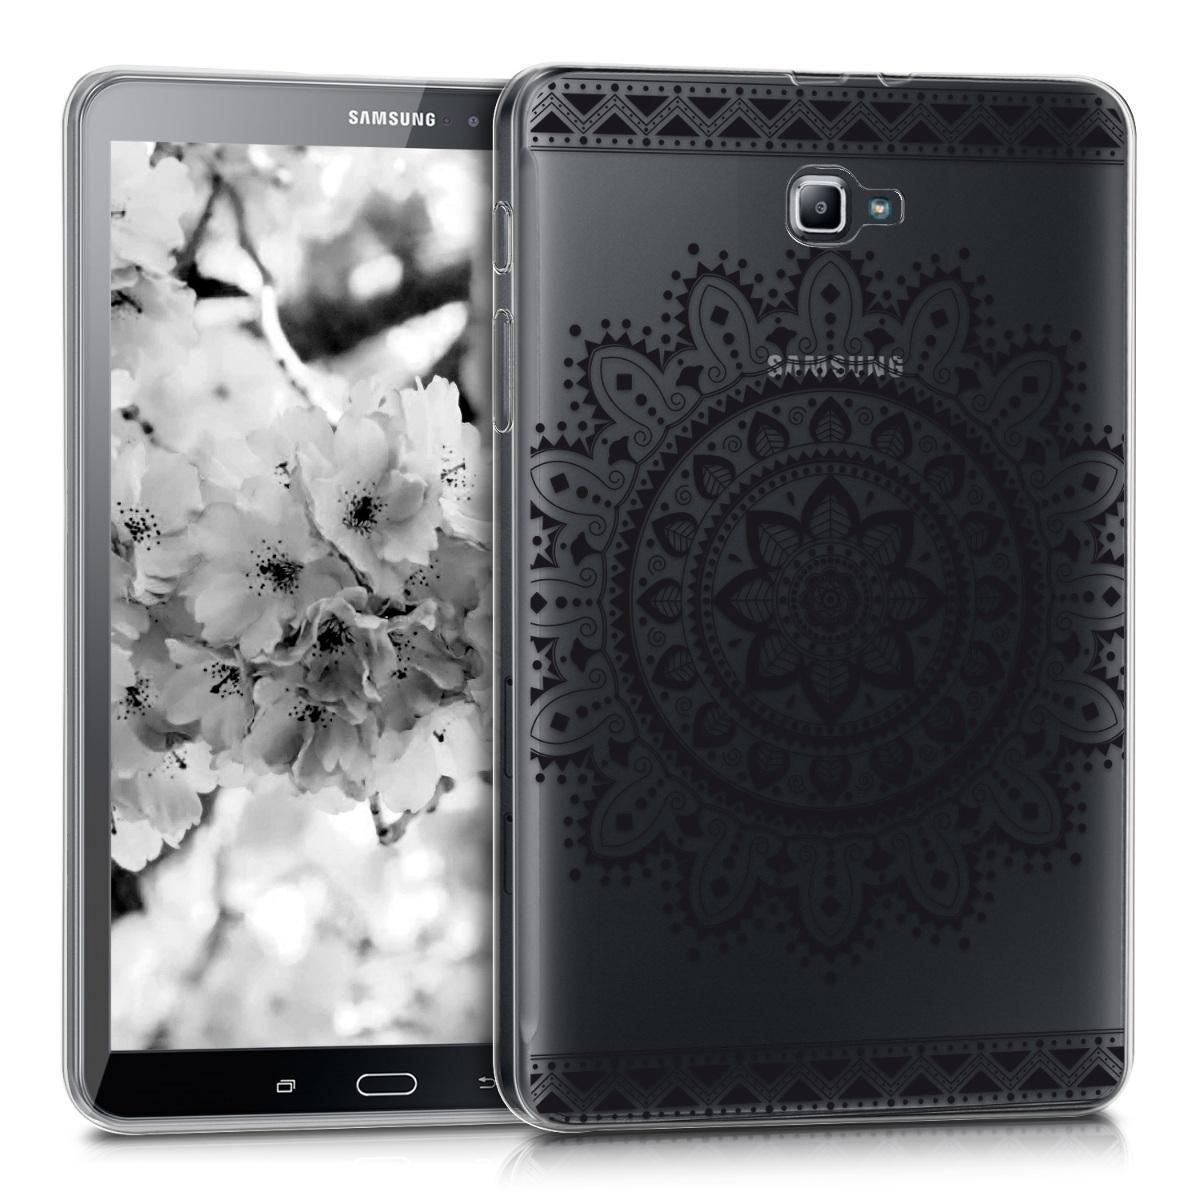 KW Θήκη Σιλικόνης Samsung Galaxy Tab A 10.1 T580N/T585N 2016 - Black / Transparent (39267.04)